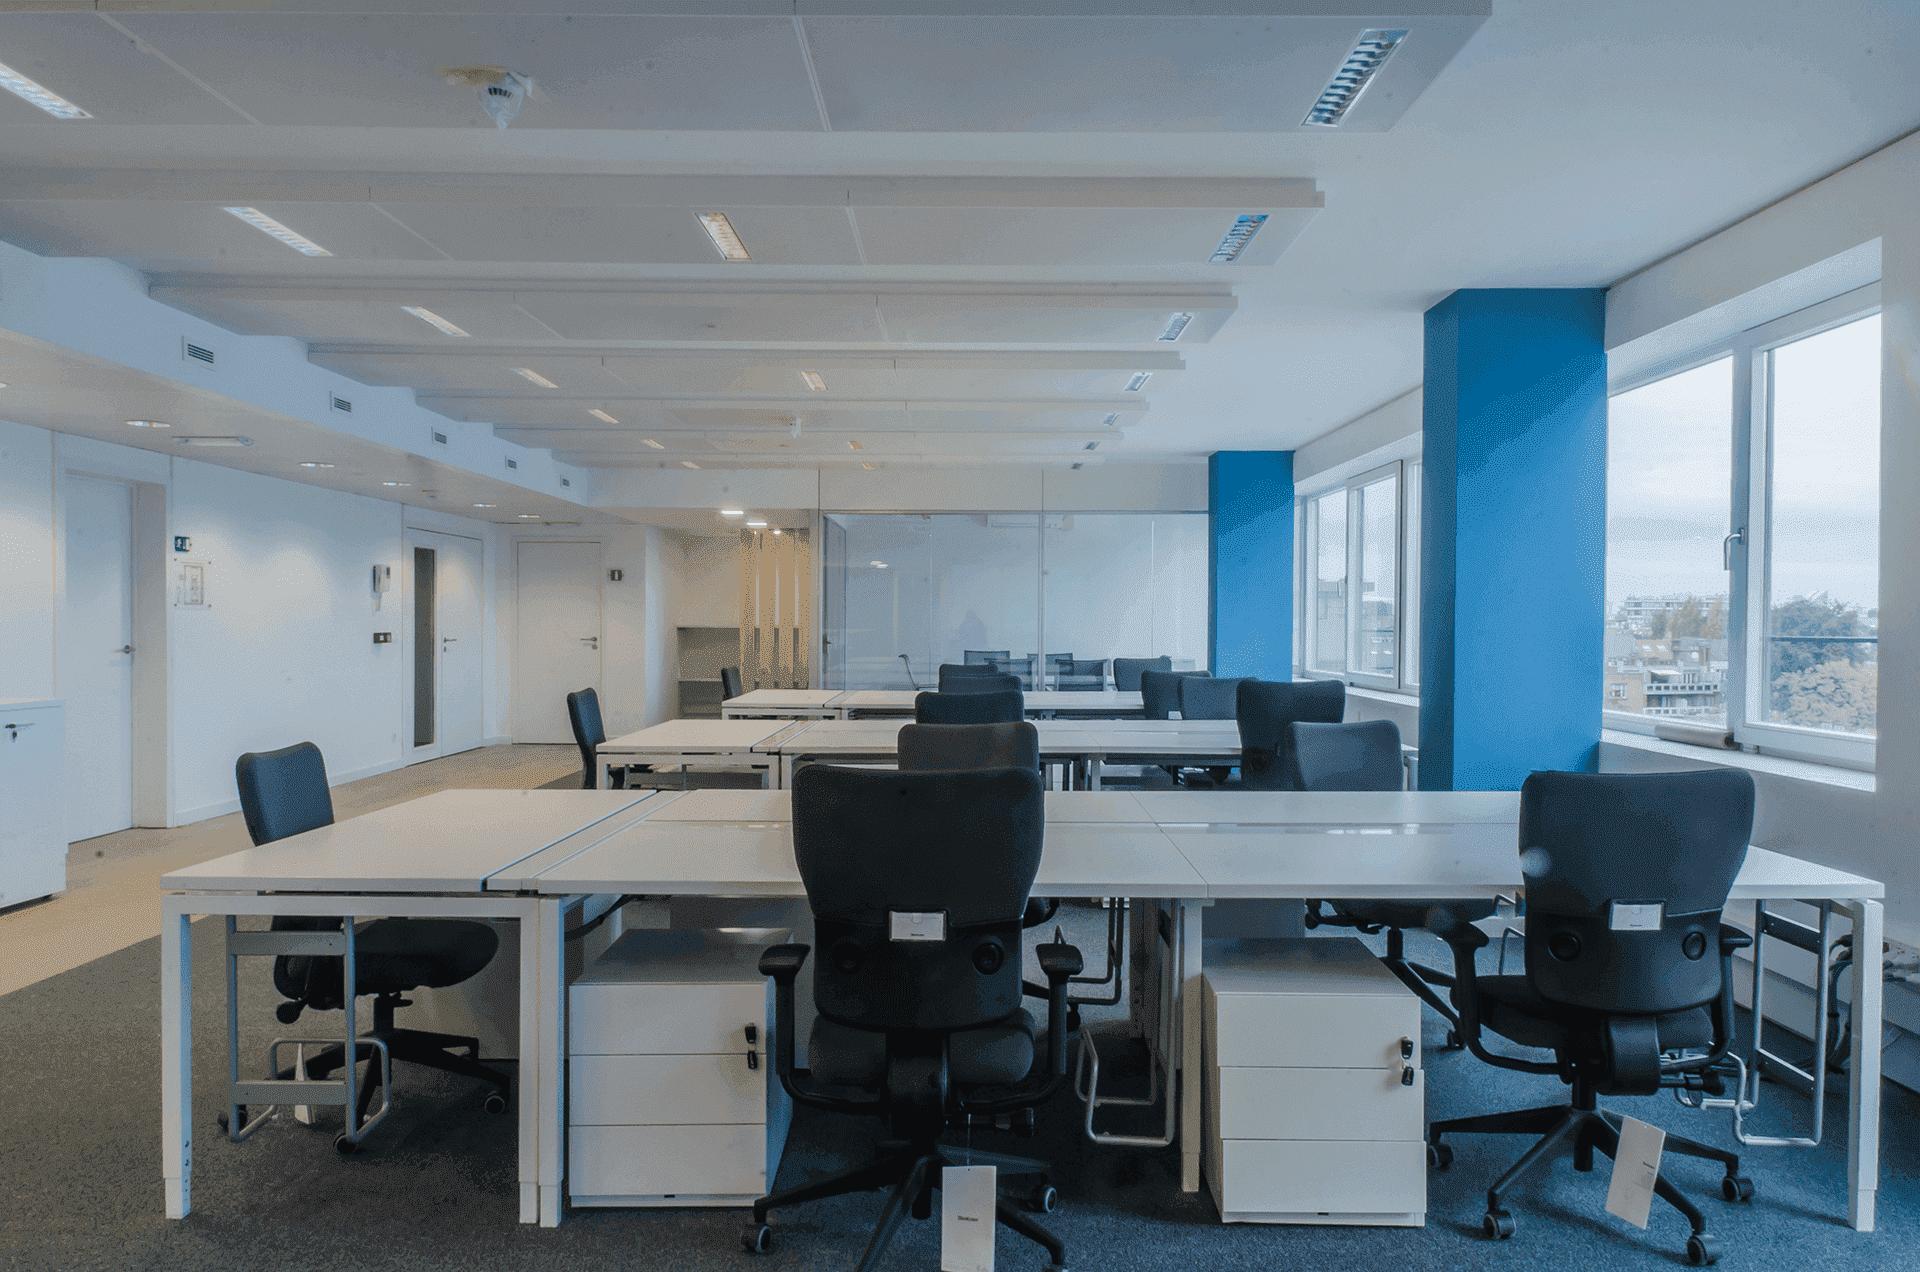 Reforma de les oficines de Transperfect a Brussel·les